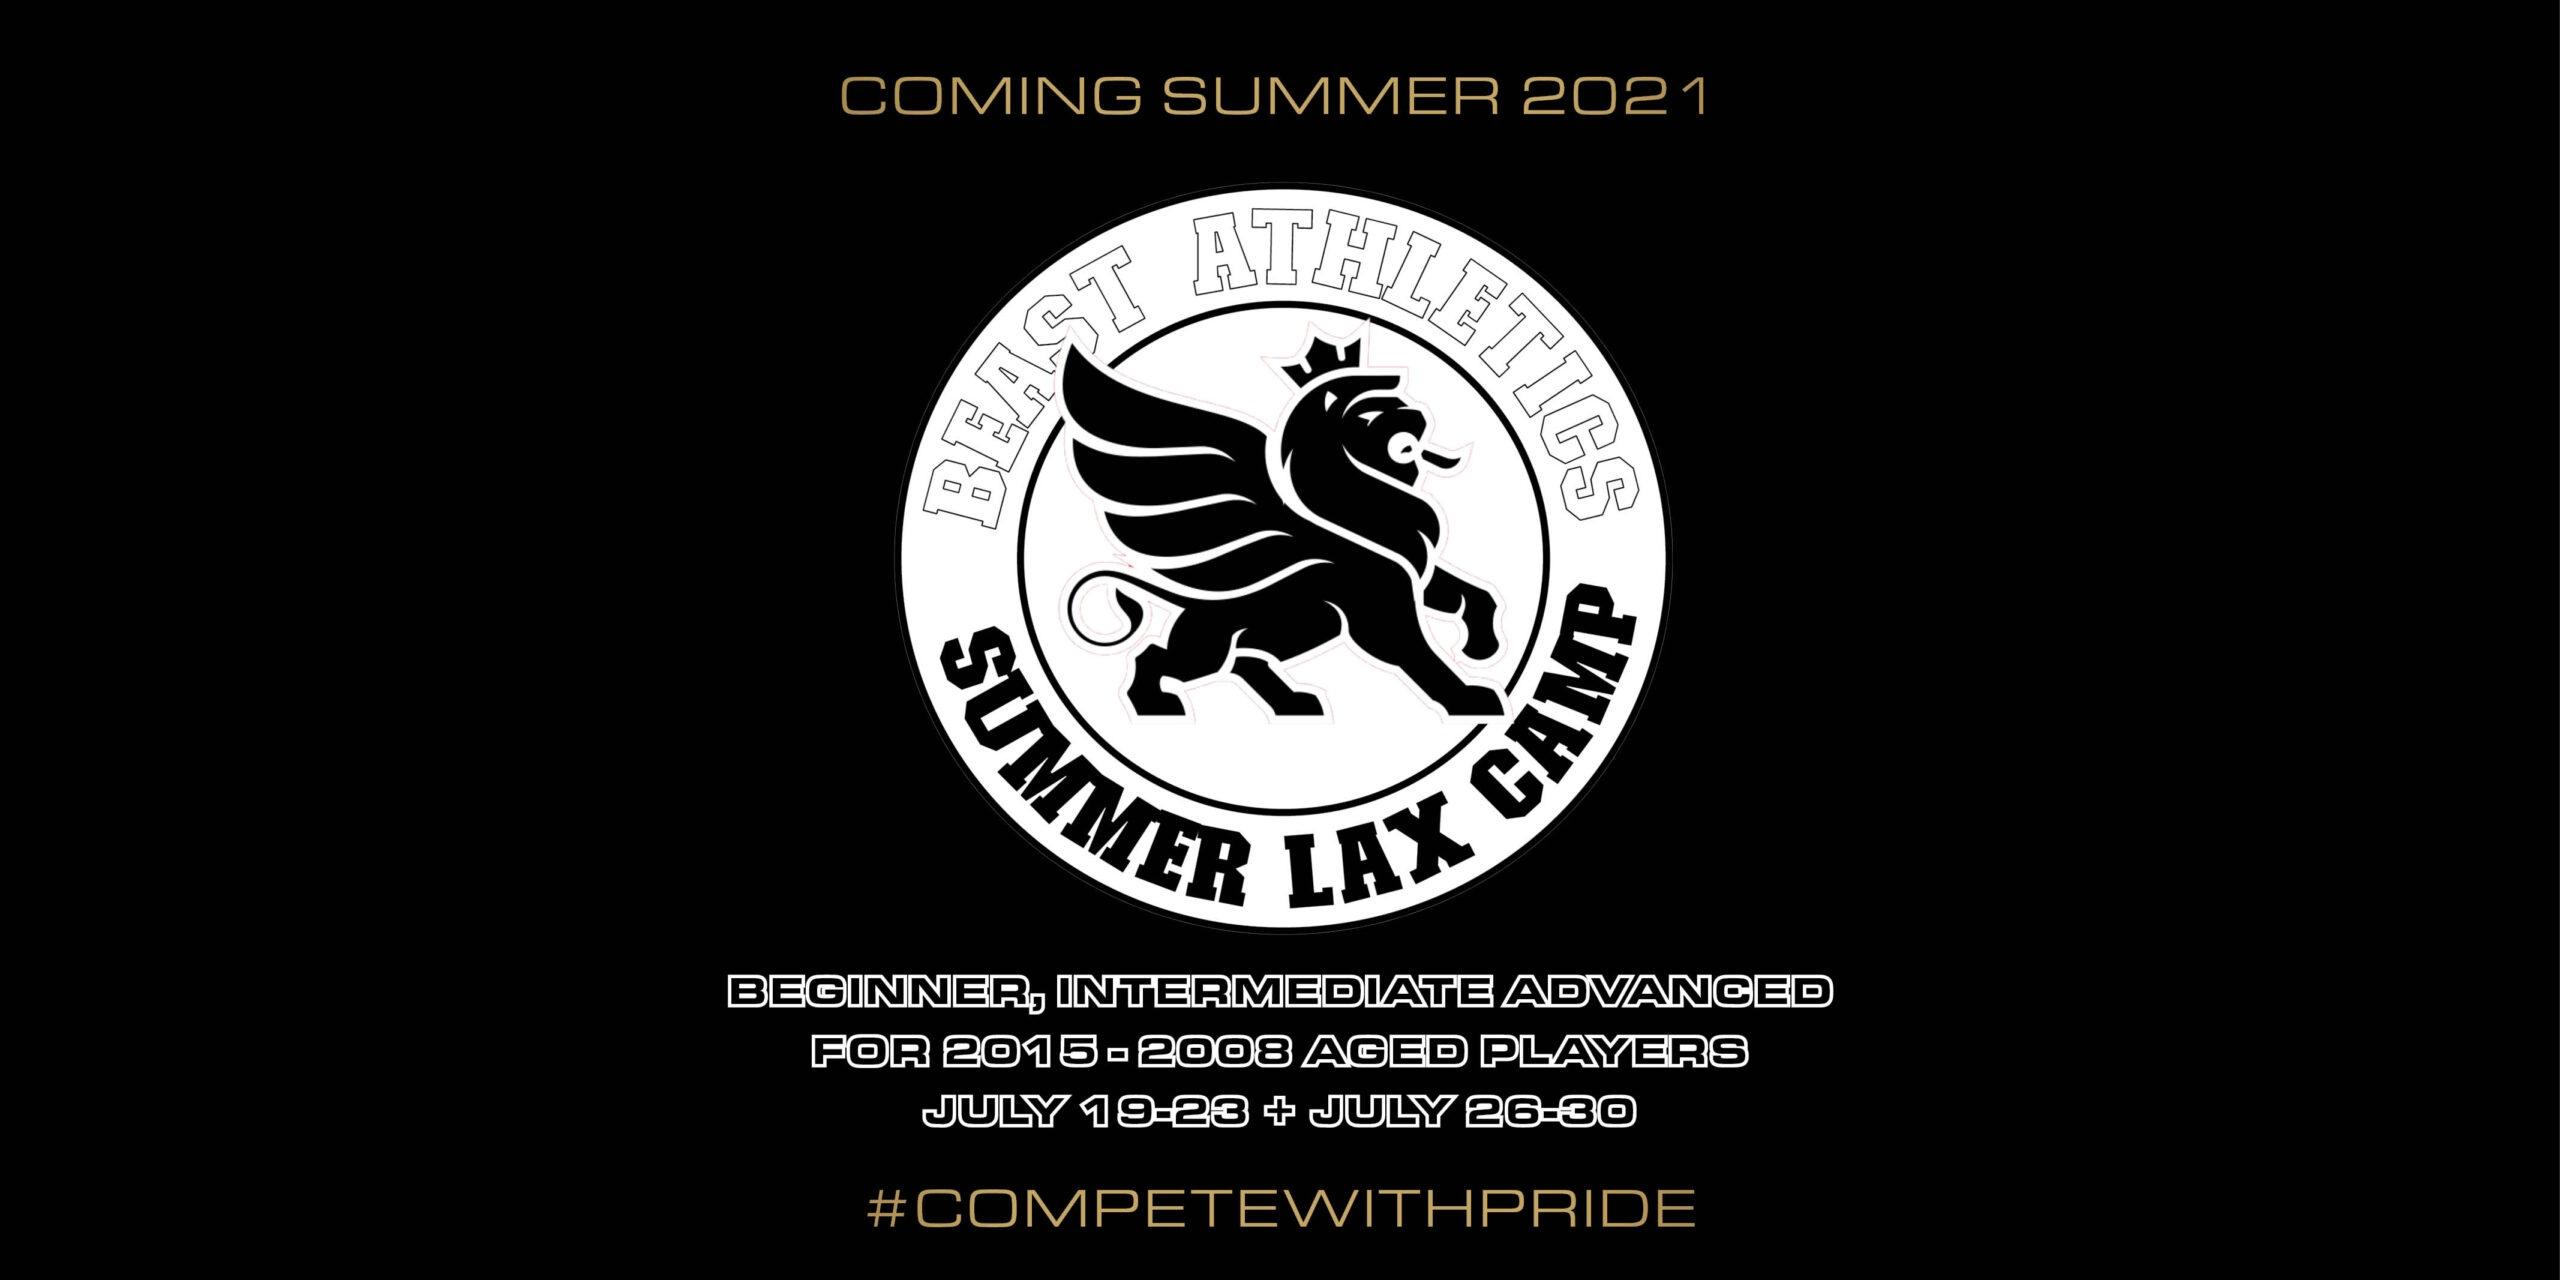 BEAST Summer Lacrosse Camp 2021 Web